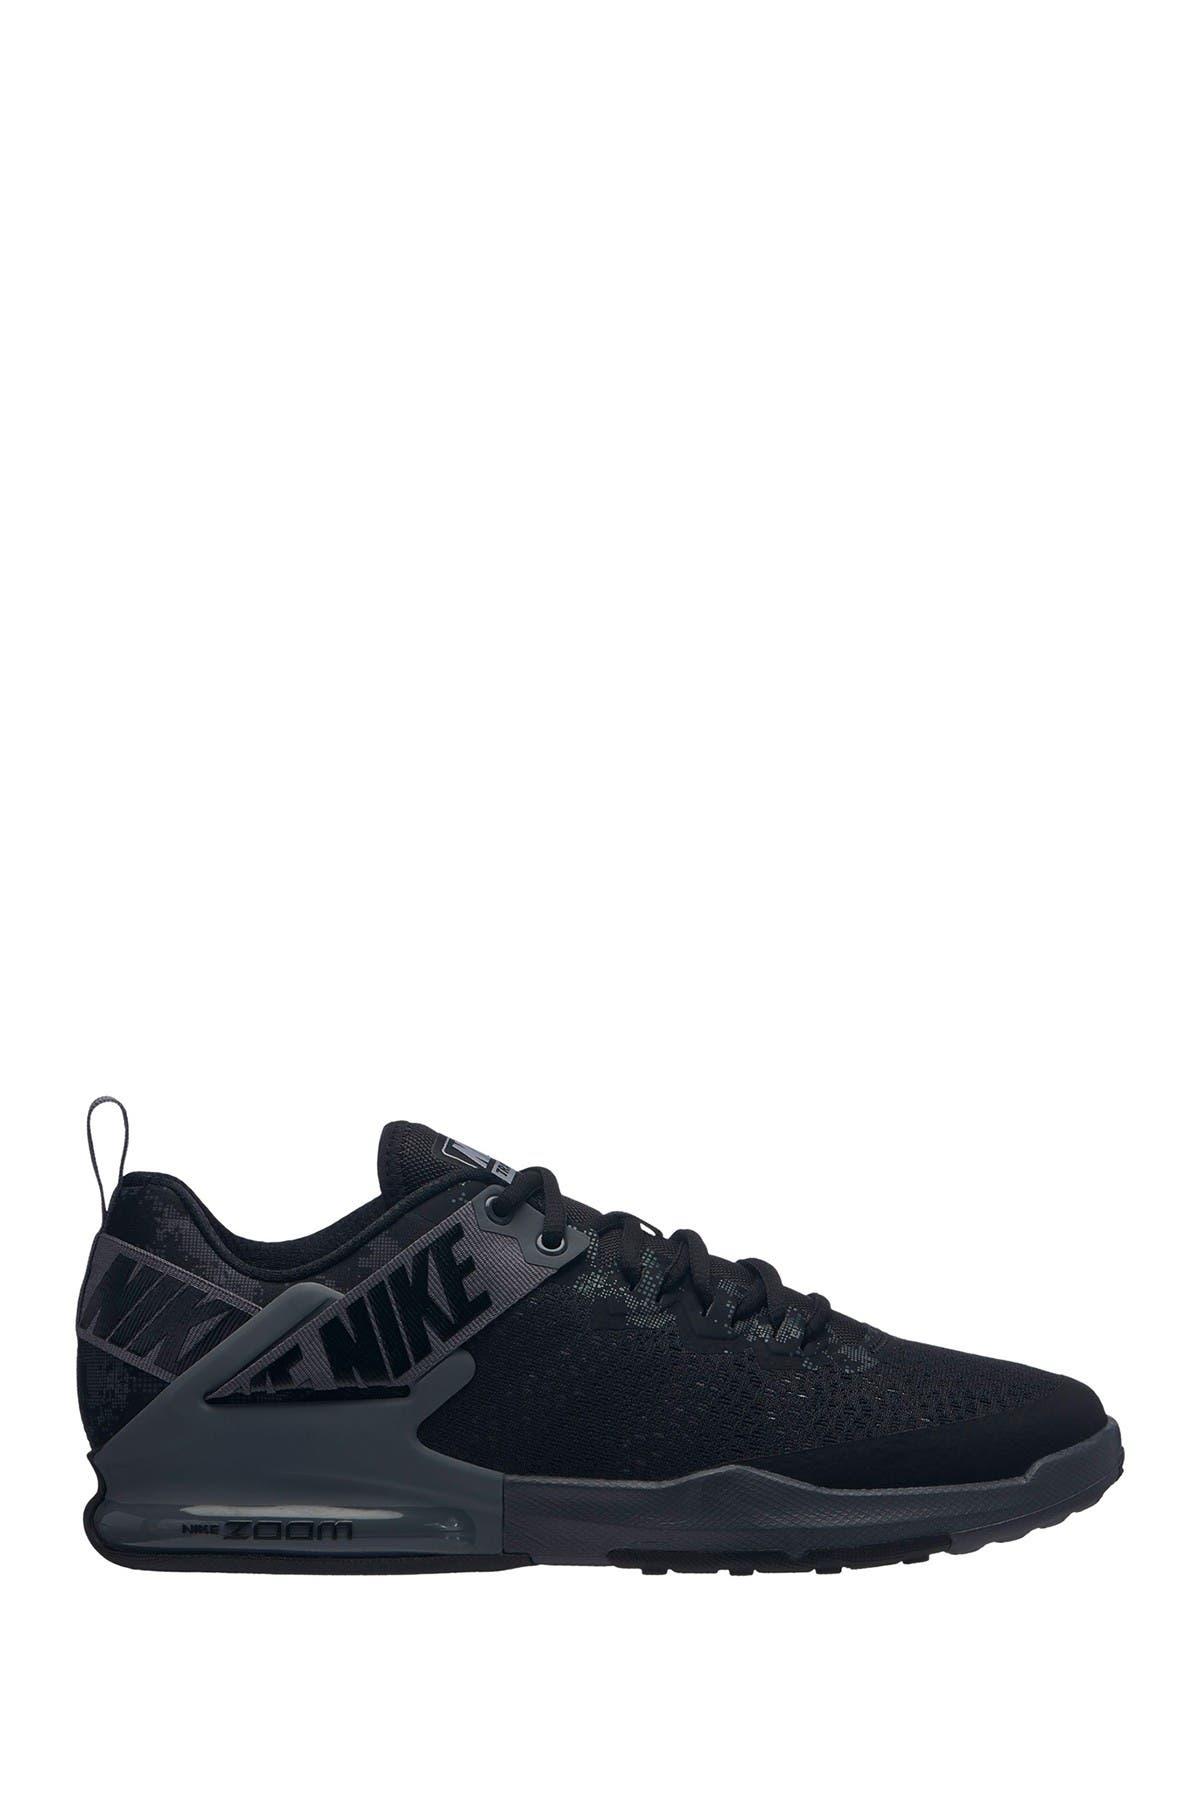 Temeridad martes estaño  Nike | Zoom Domination TR 2 Training Sneaker | Nordstrom Rack